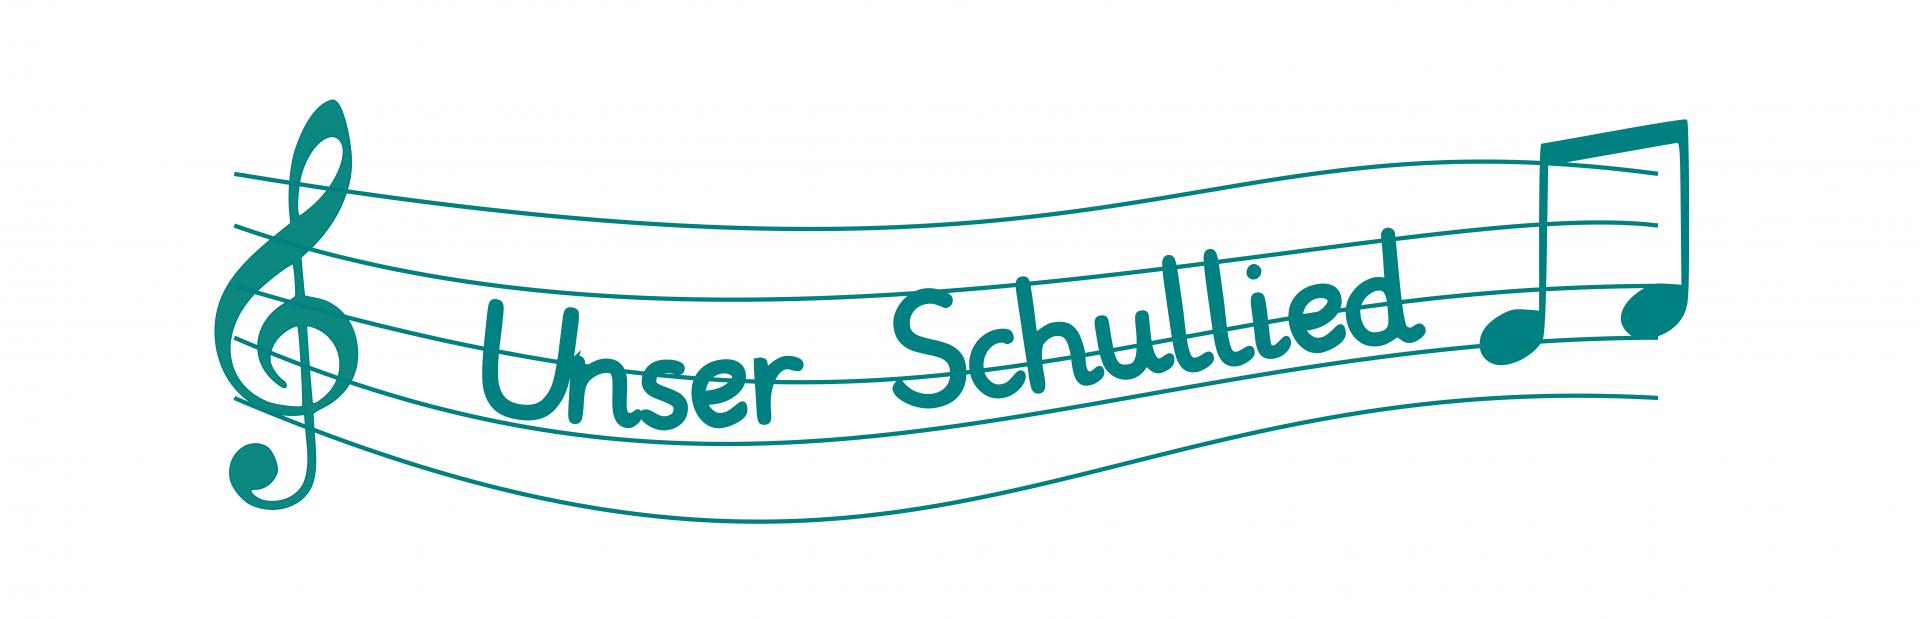 Schullied2